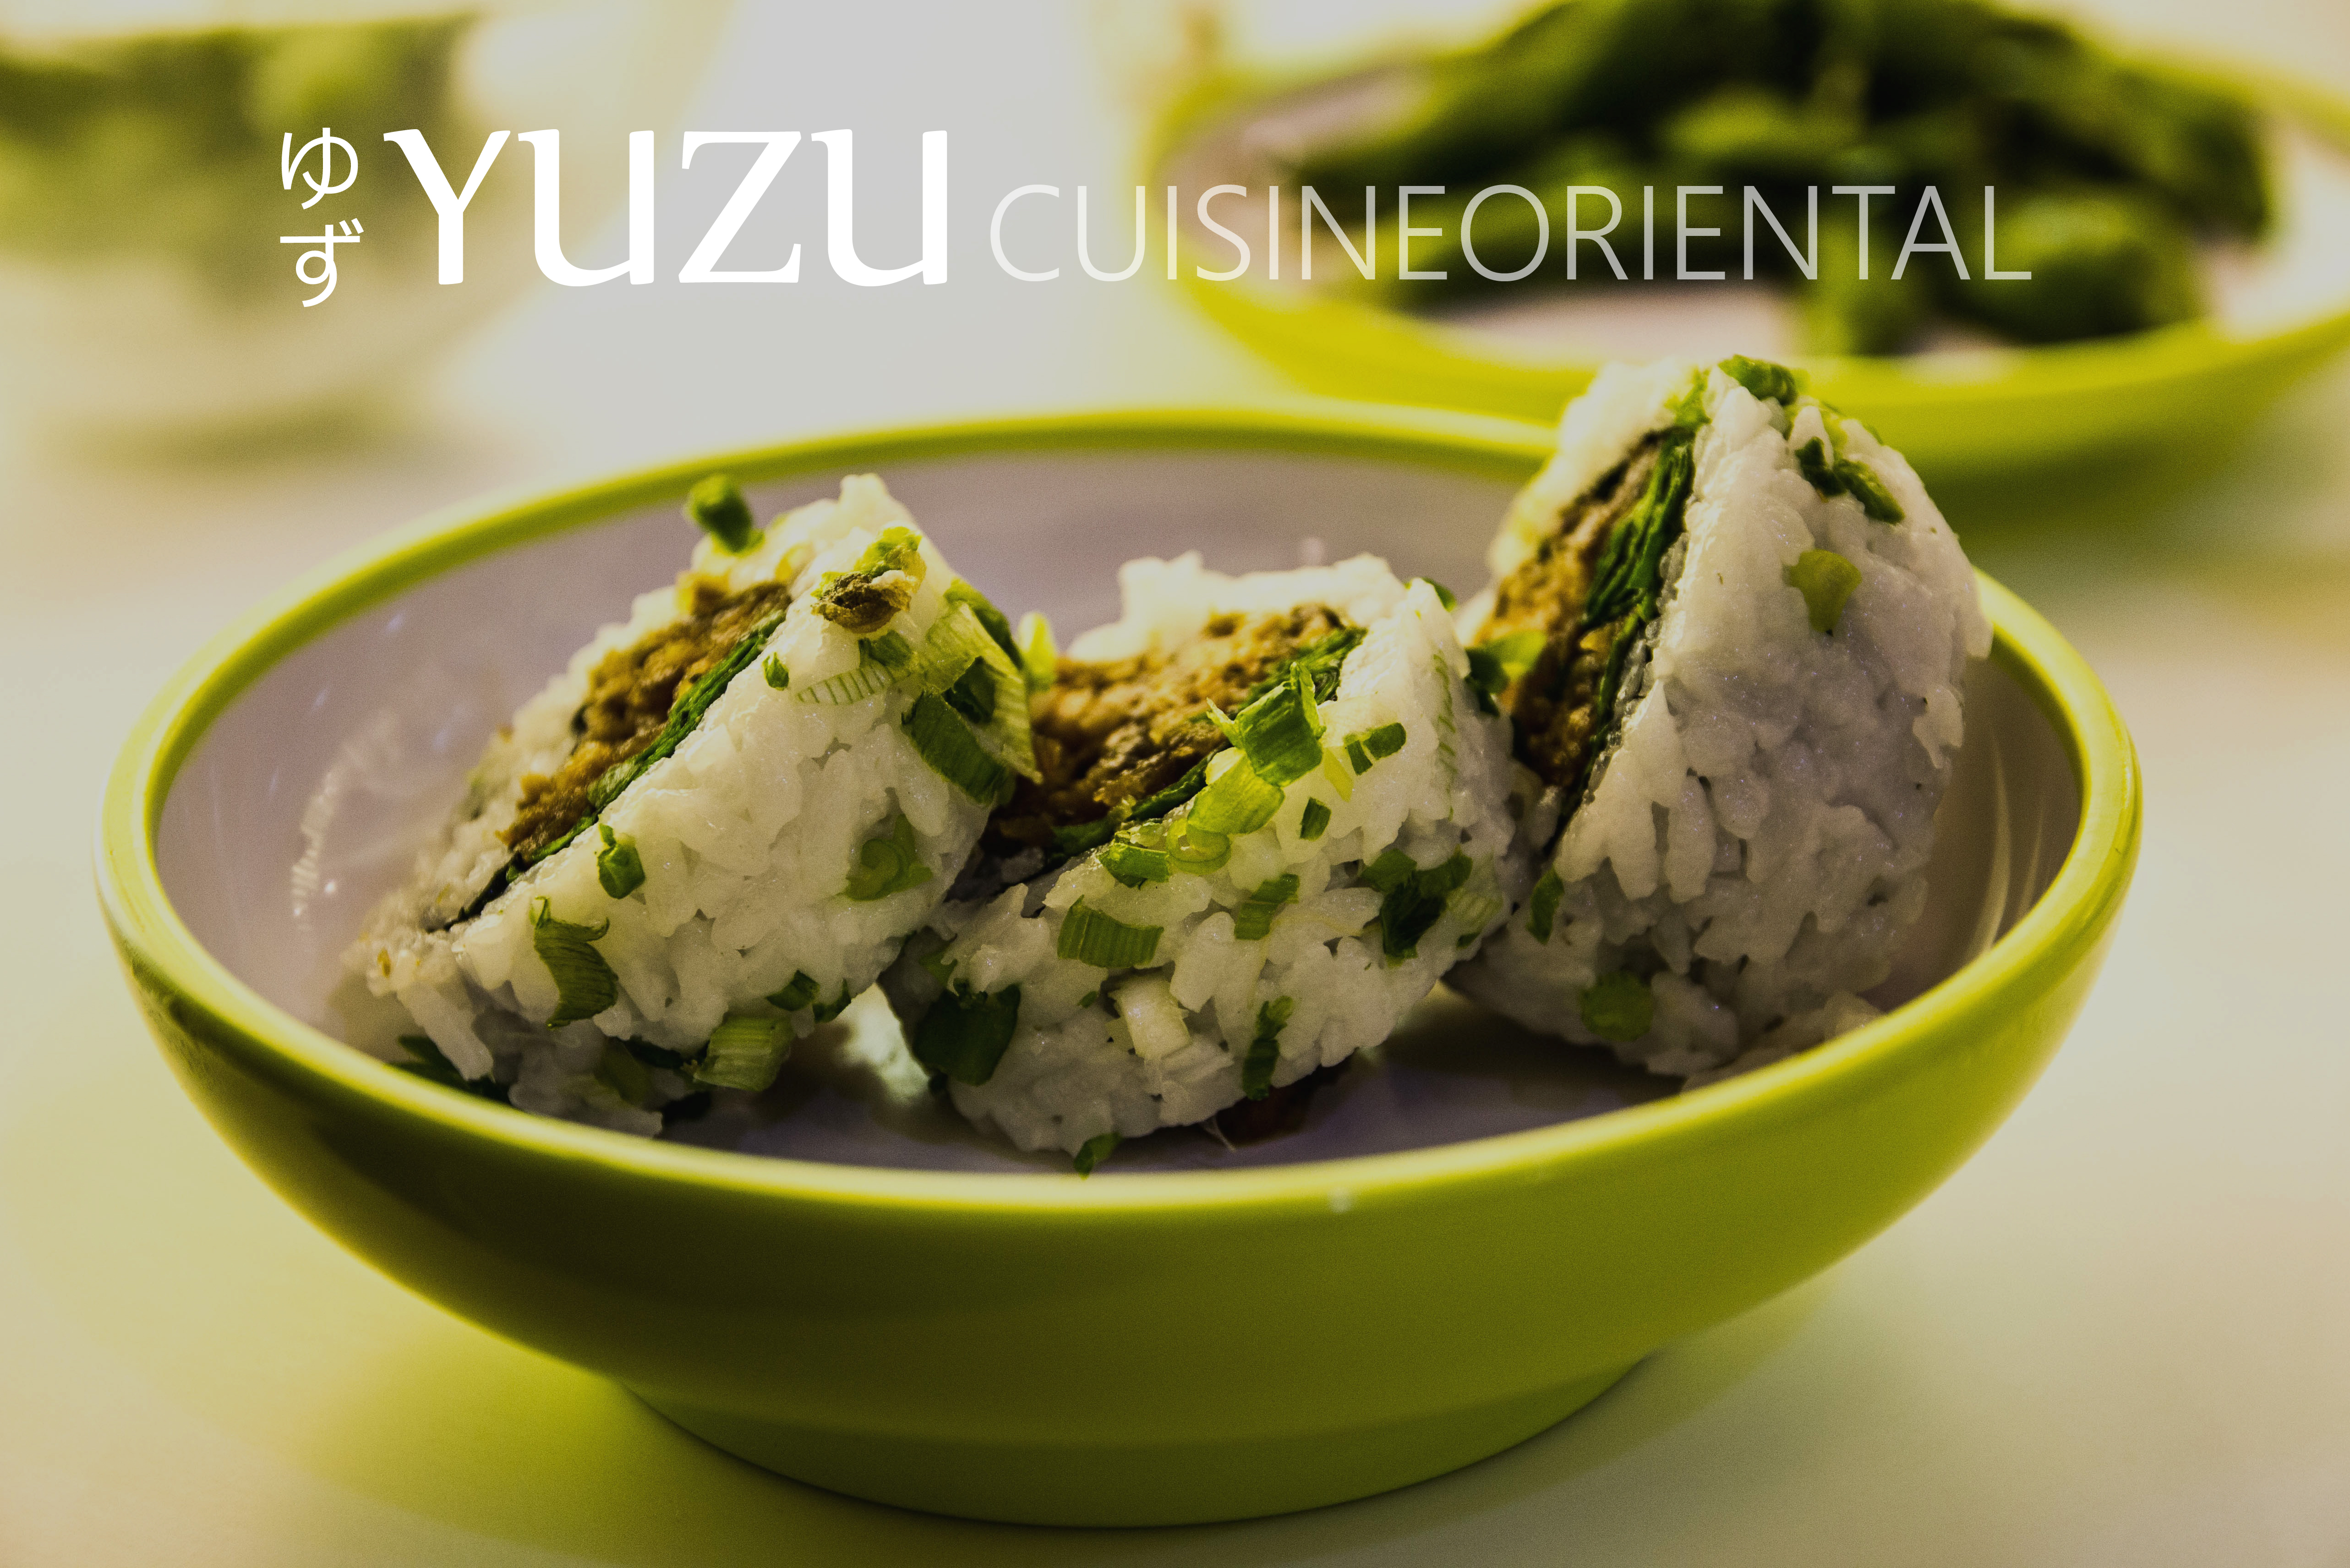 Yuzu cocina oriental